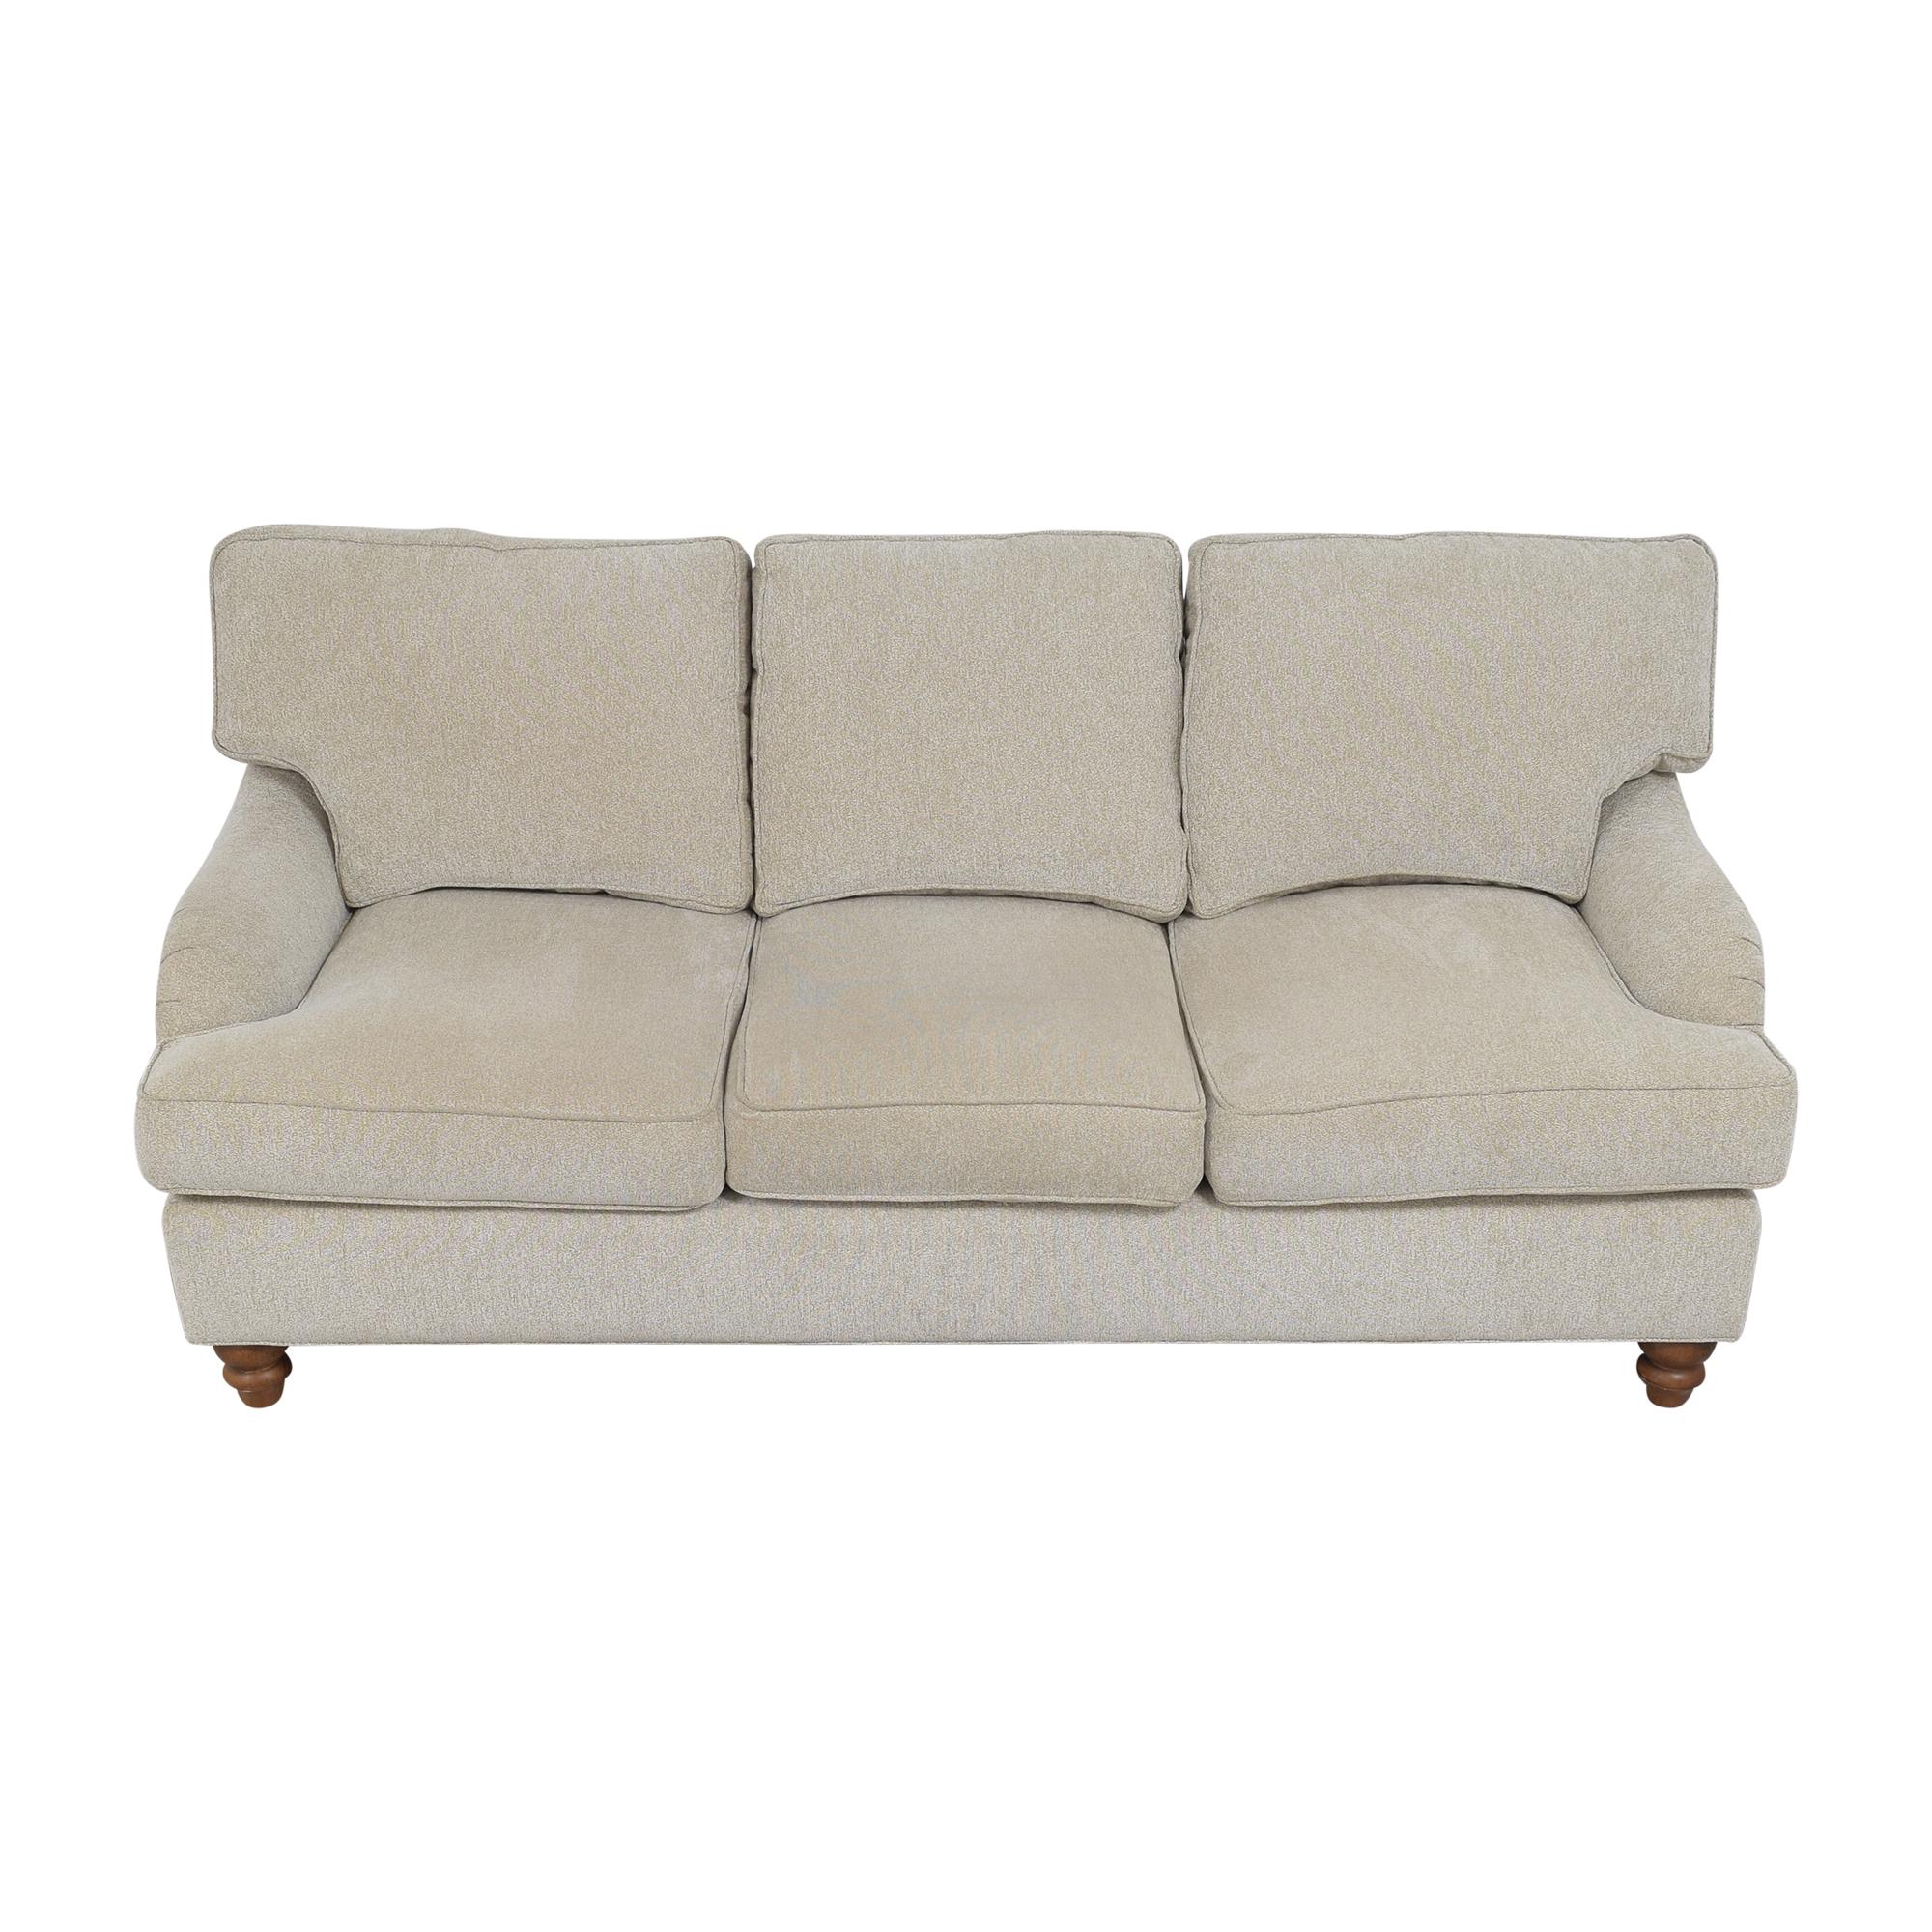 Drexel Heritage Drexel Heritage Three Cushion Sofa Sofas